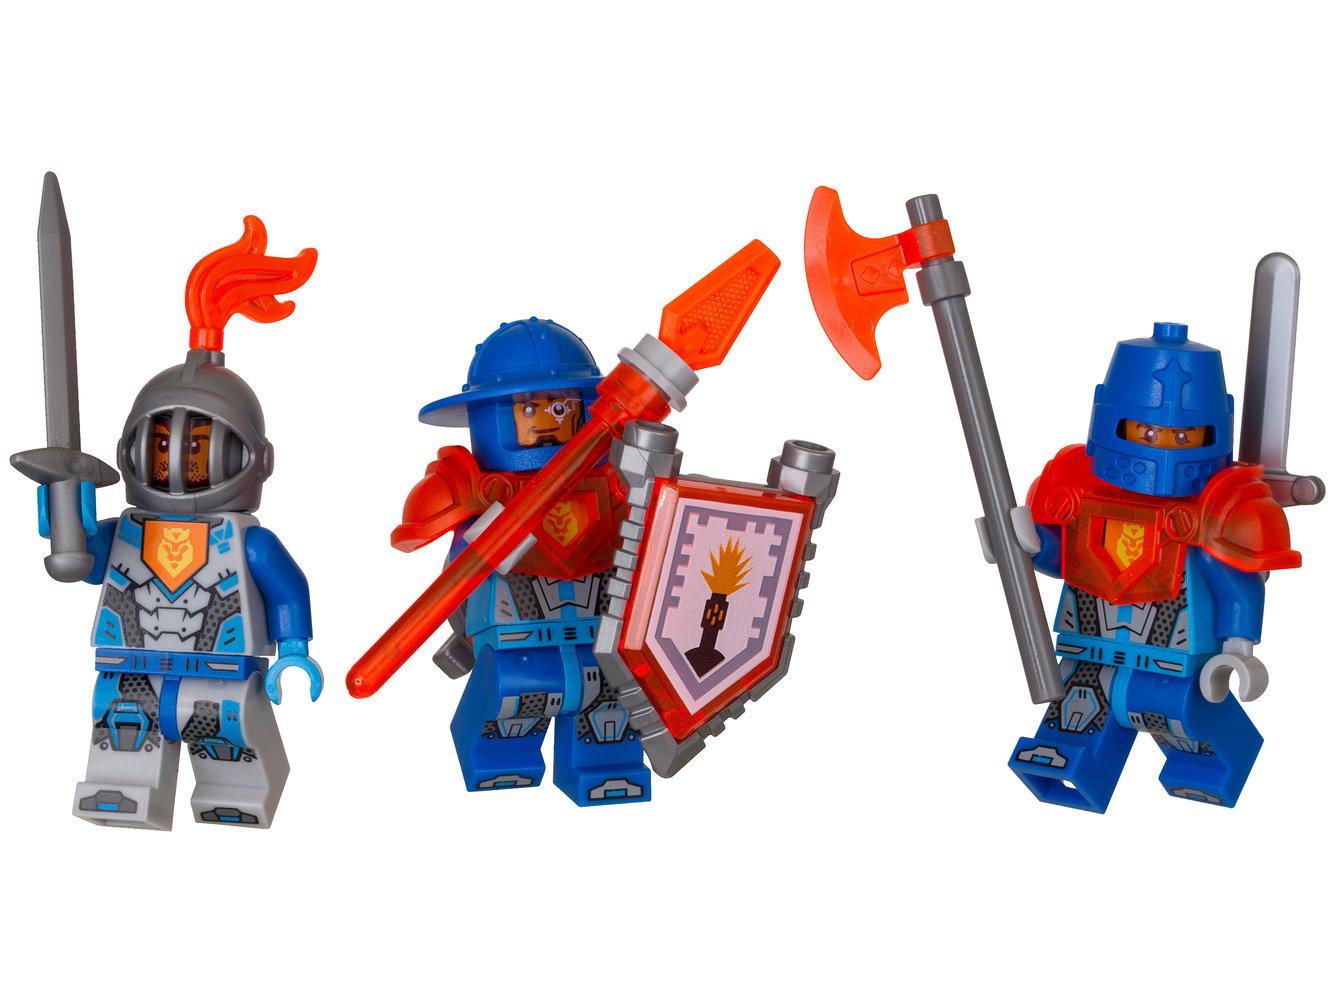 Nexo Knights Accessory Set